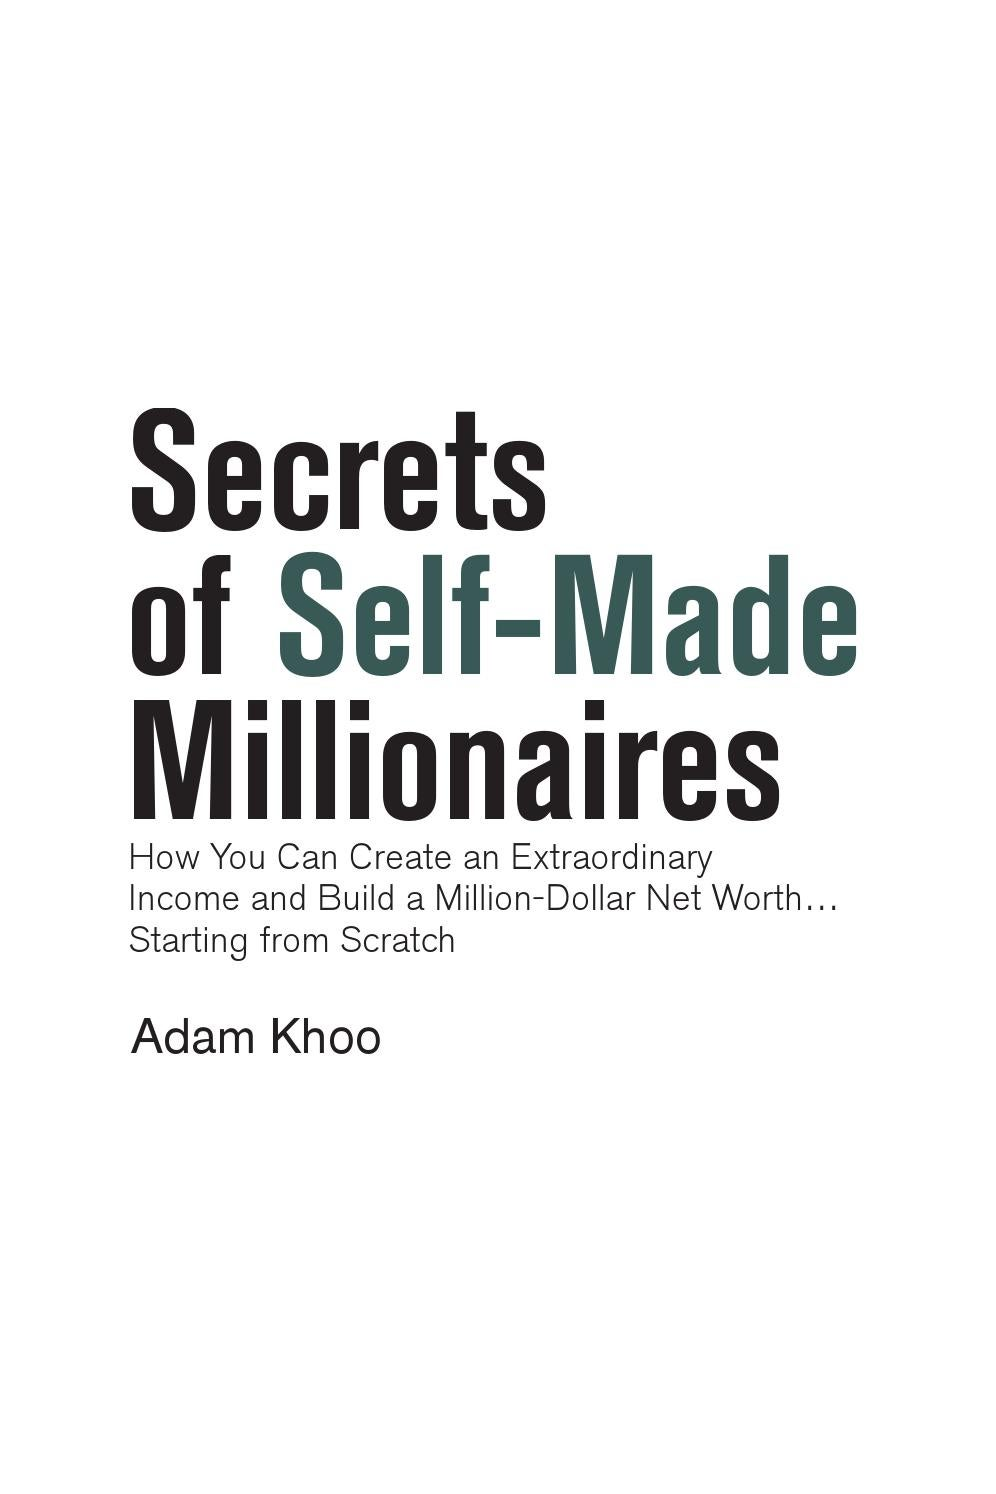 Secrets Of Self-Made Millionaires_Adam Khoo by Khemerakh - issuu